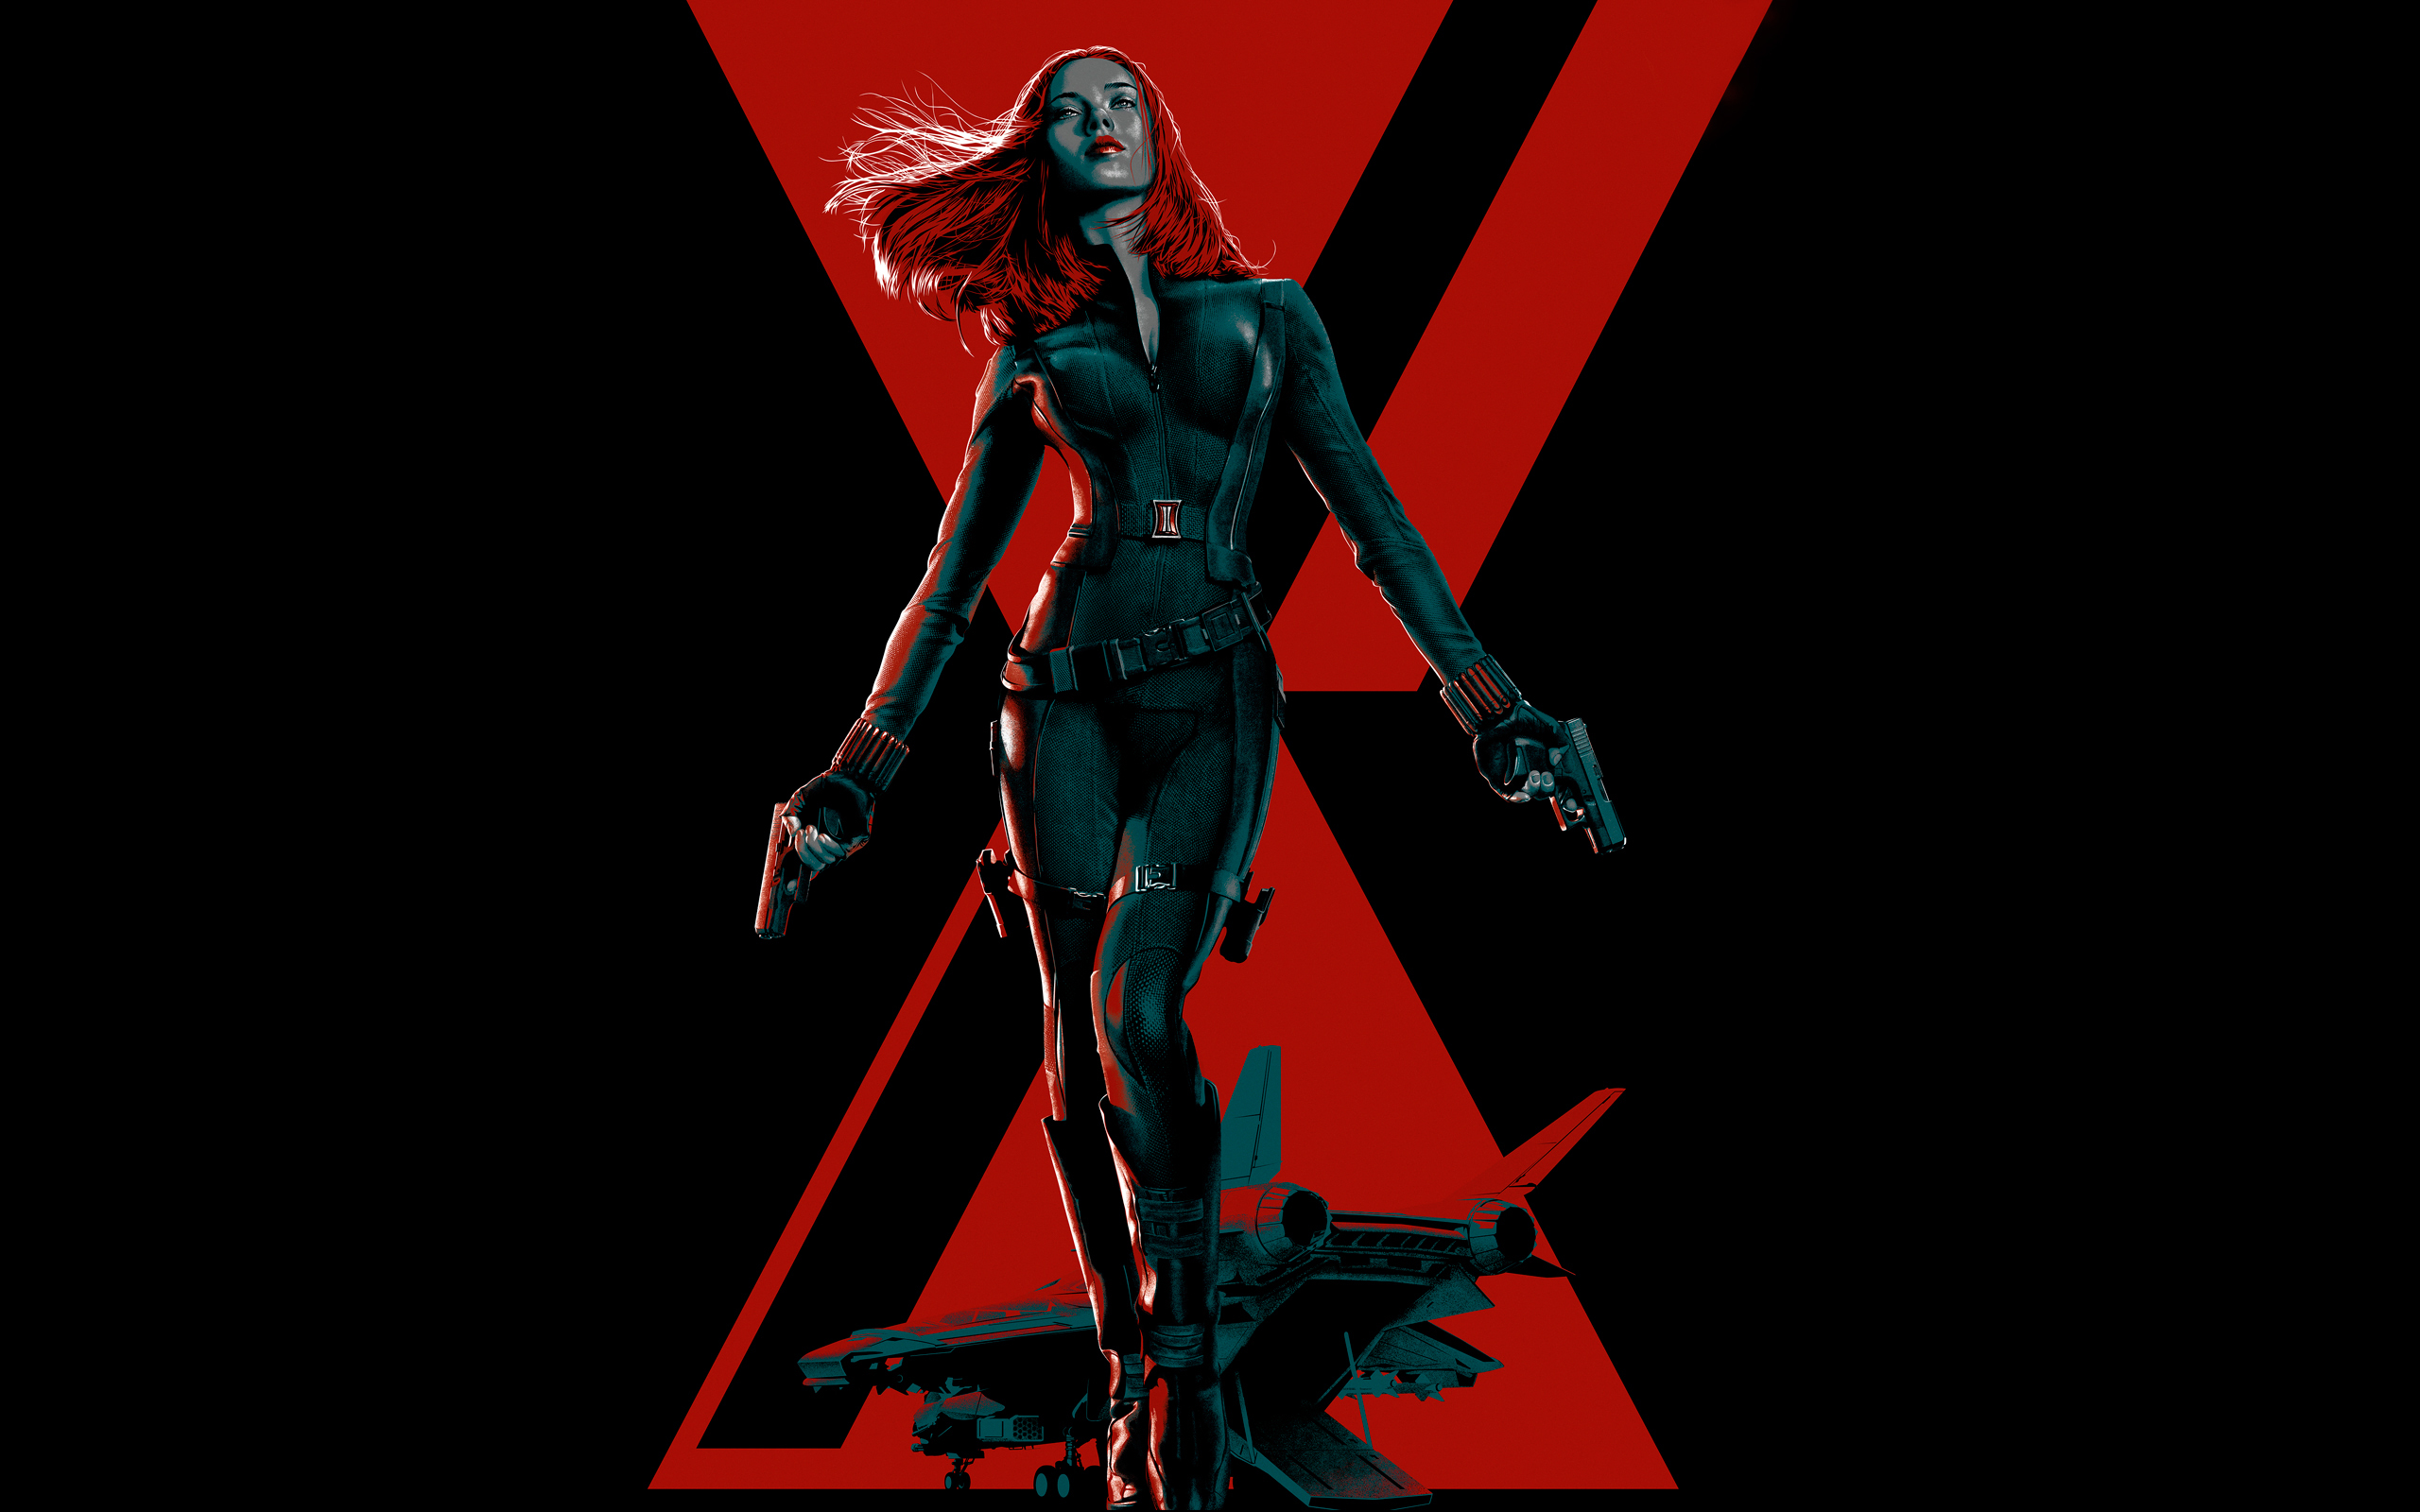 Captain America The Winter Soldier Scarlett Johansson Wallpapers ID588302